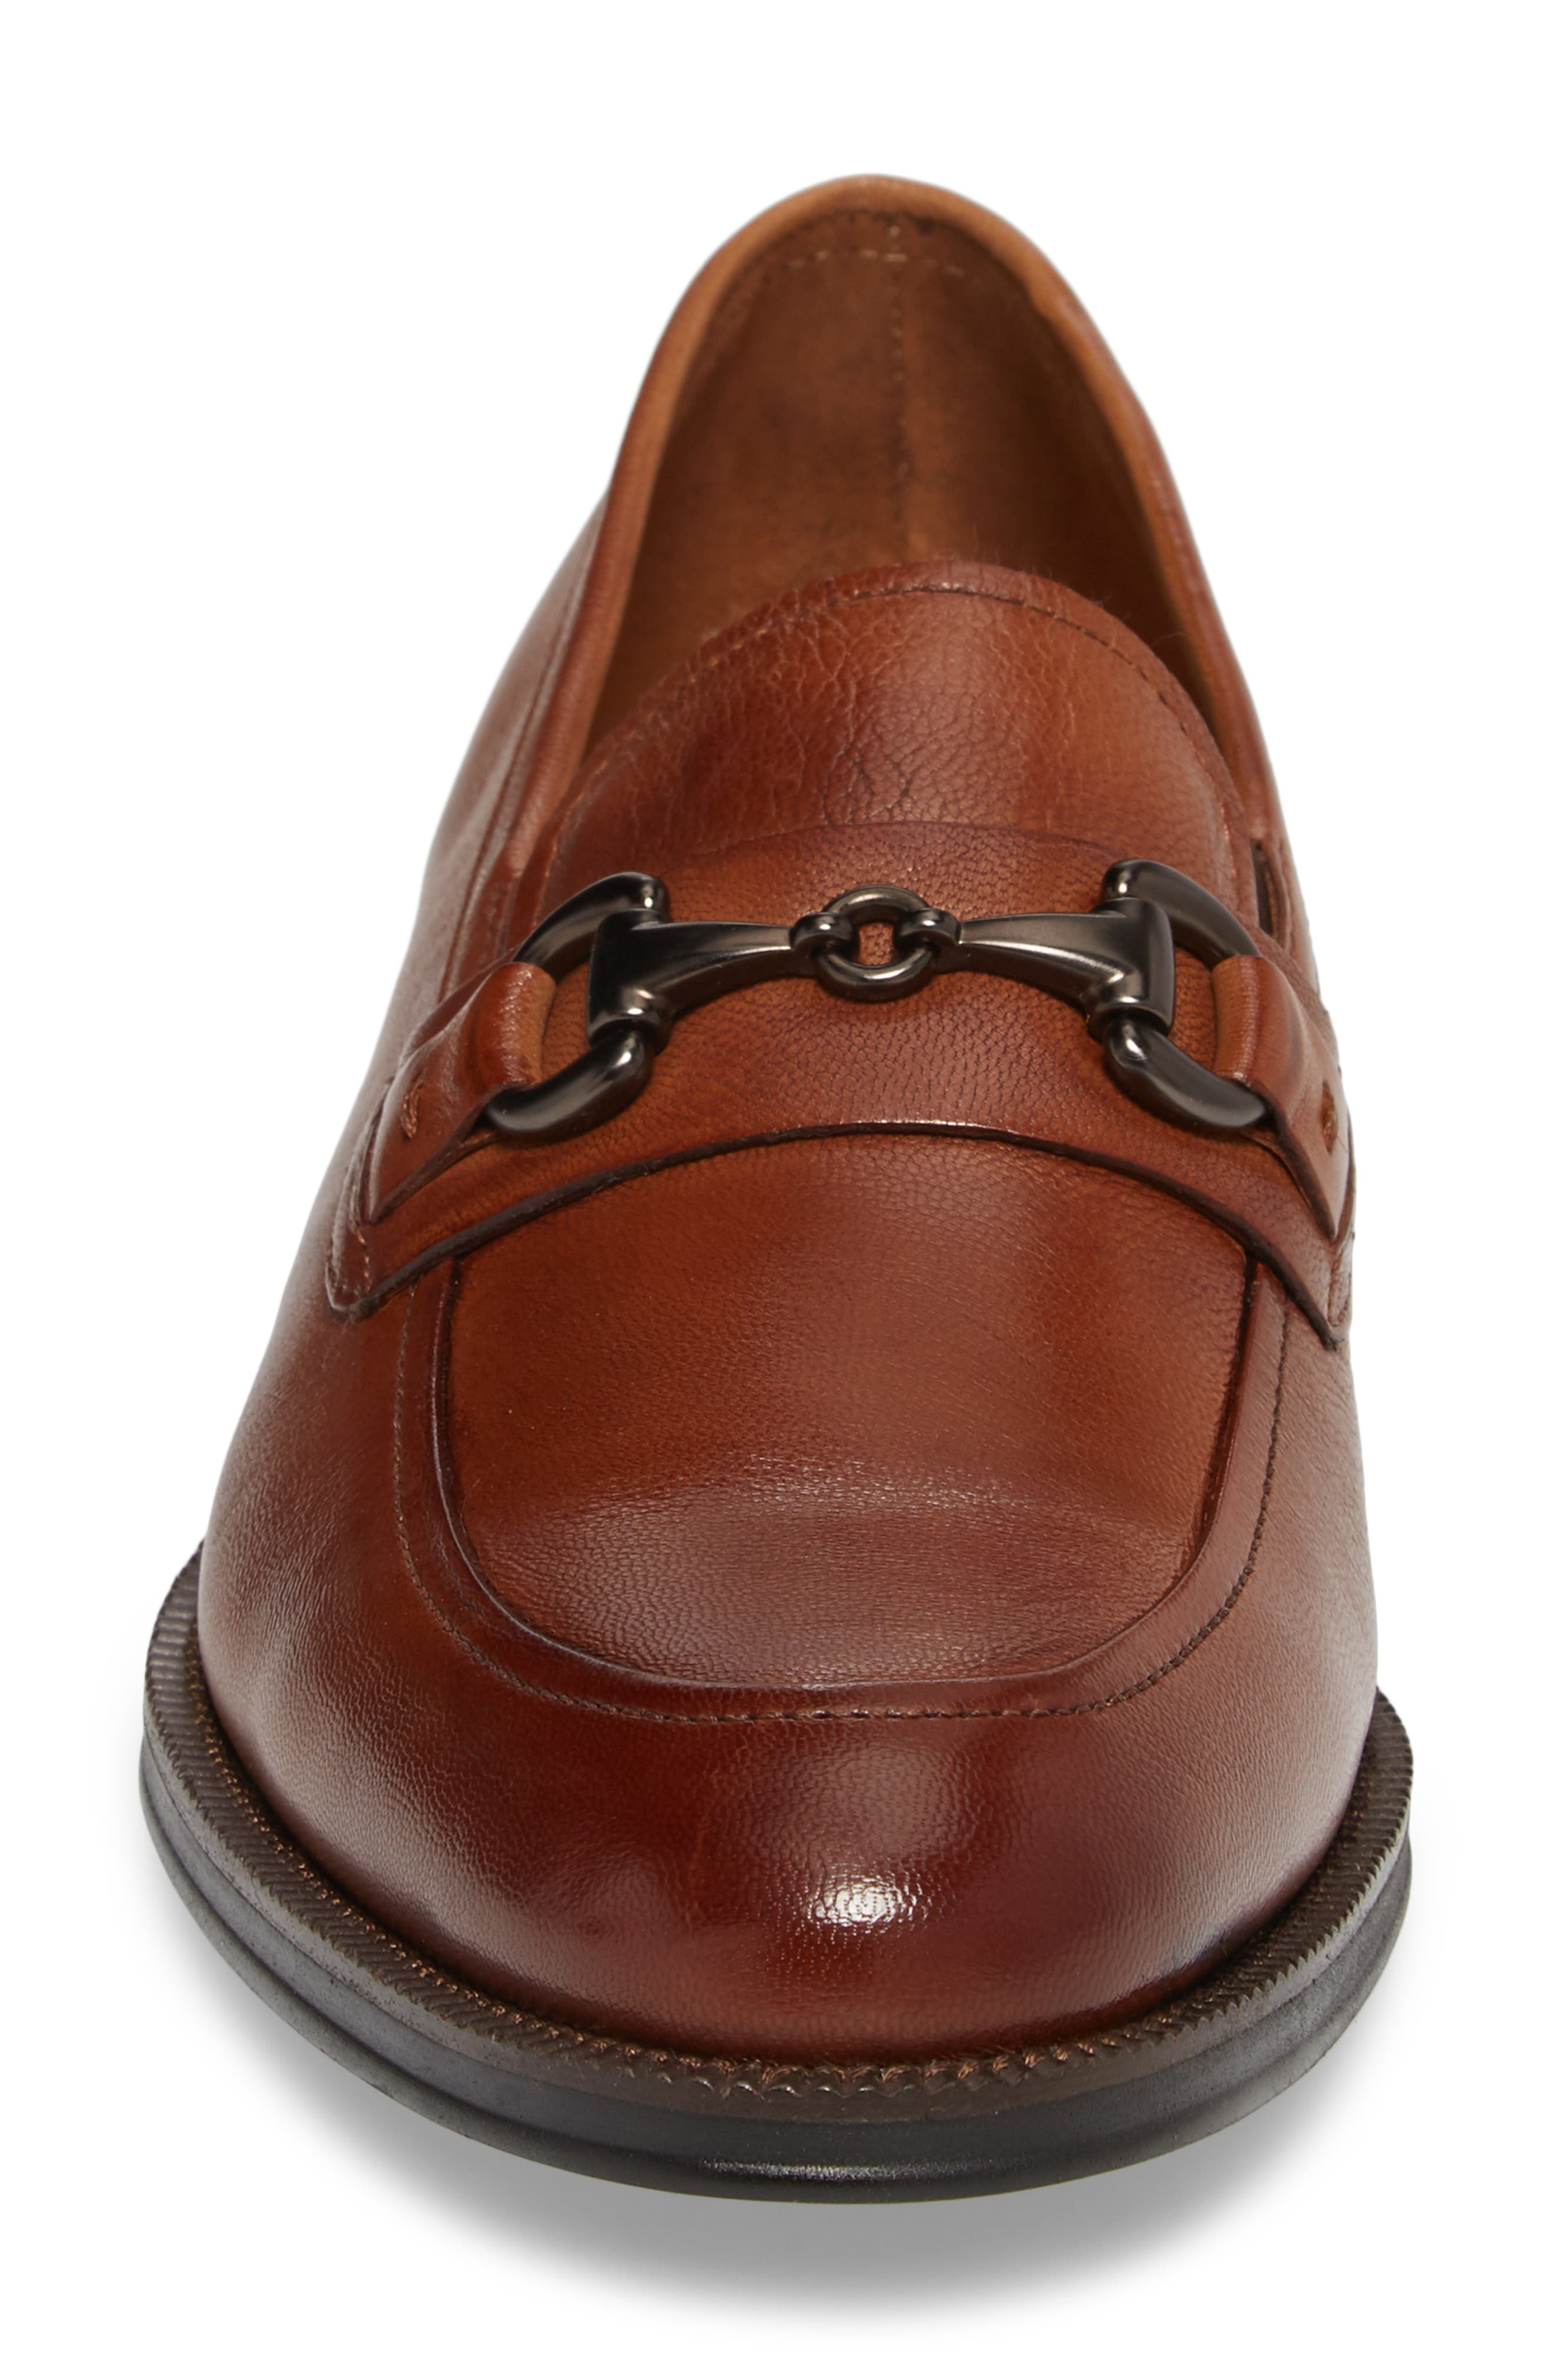 Brock Bit Loafer,                             Alternate thumbnail 4, color,                             Cognac Leather